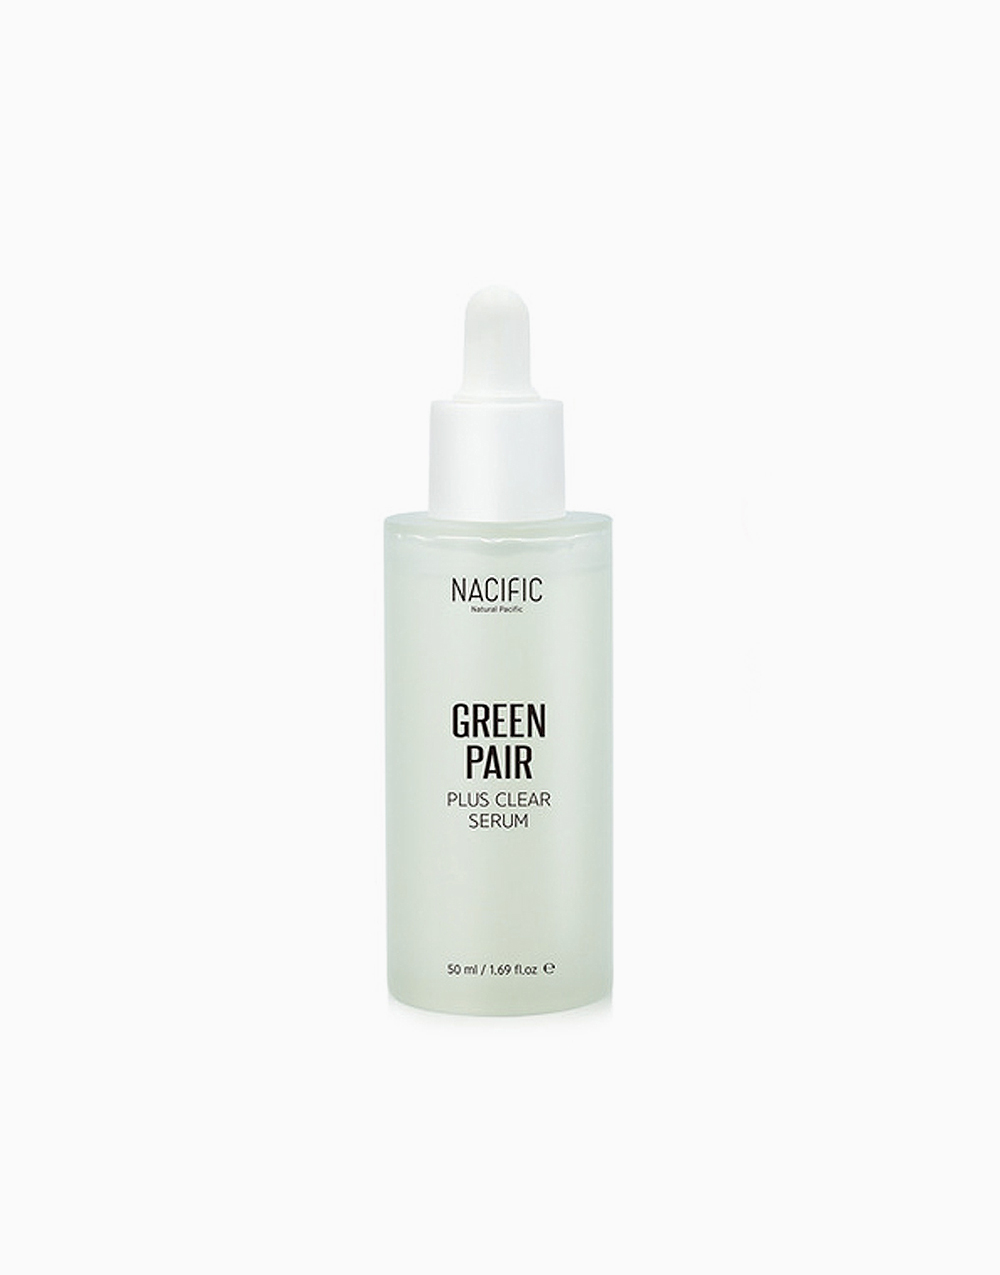 Green Pair Plus Clear Serum by Nacific